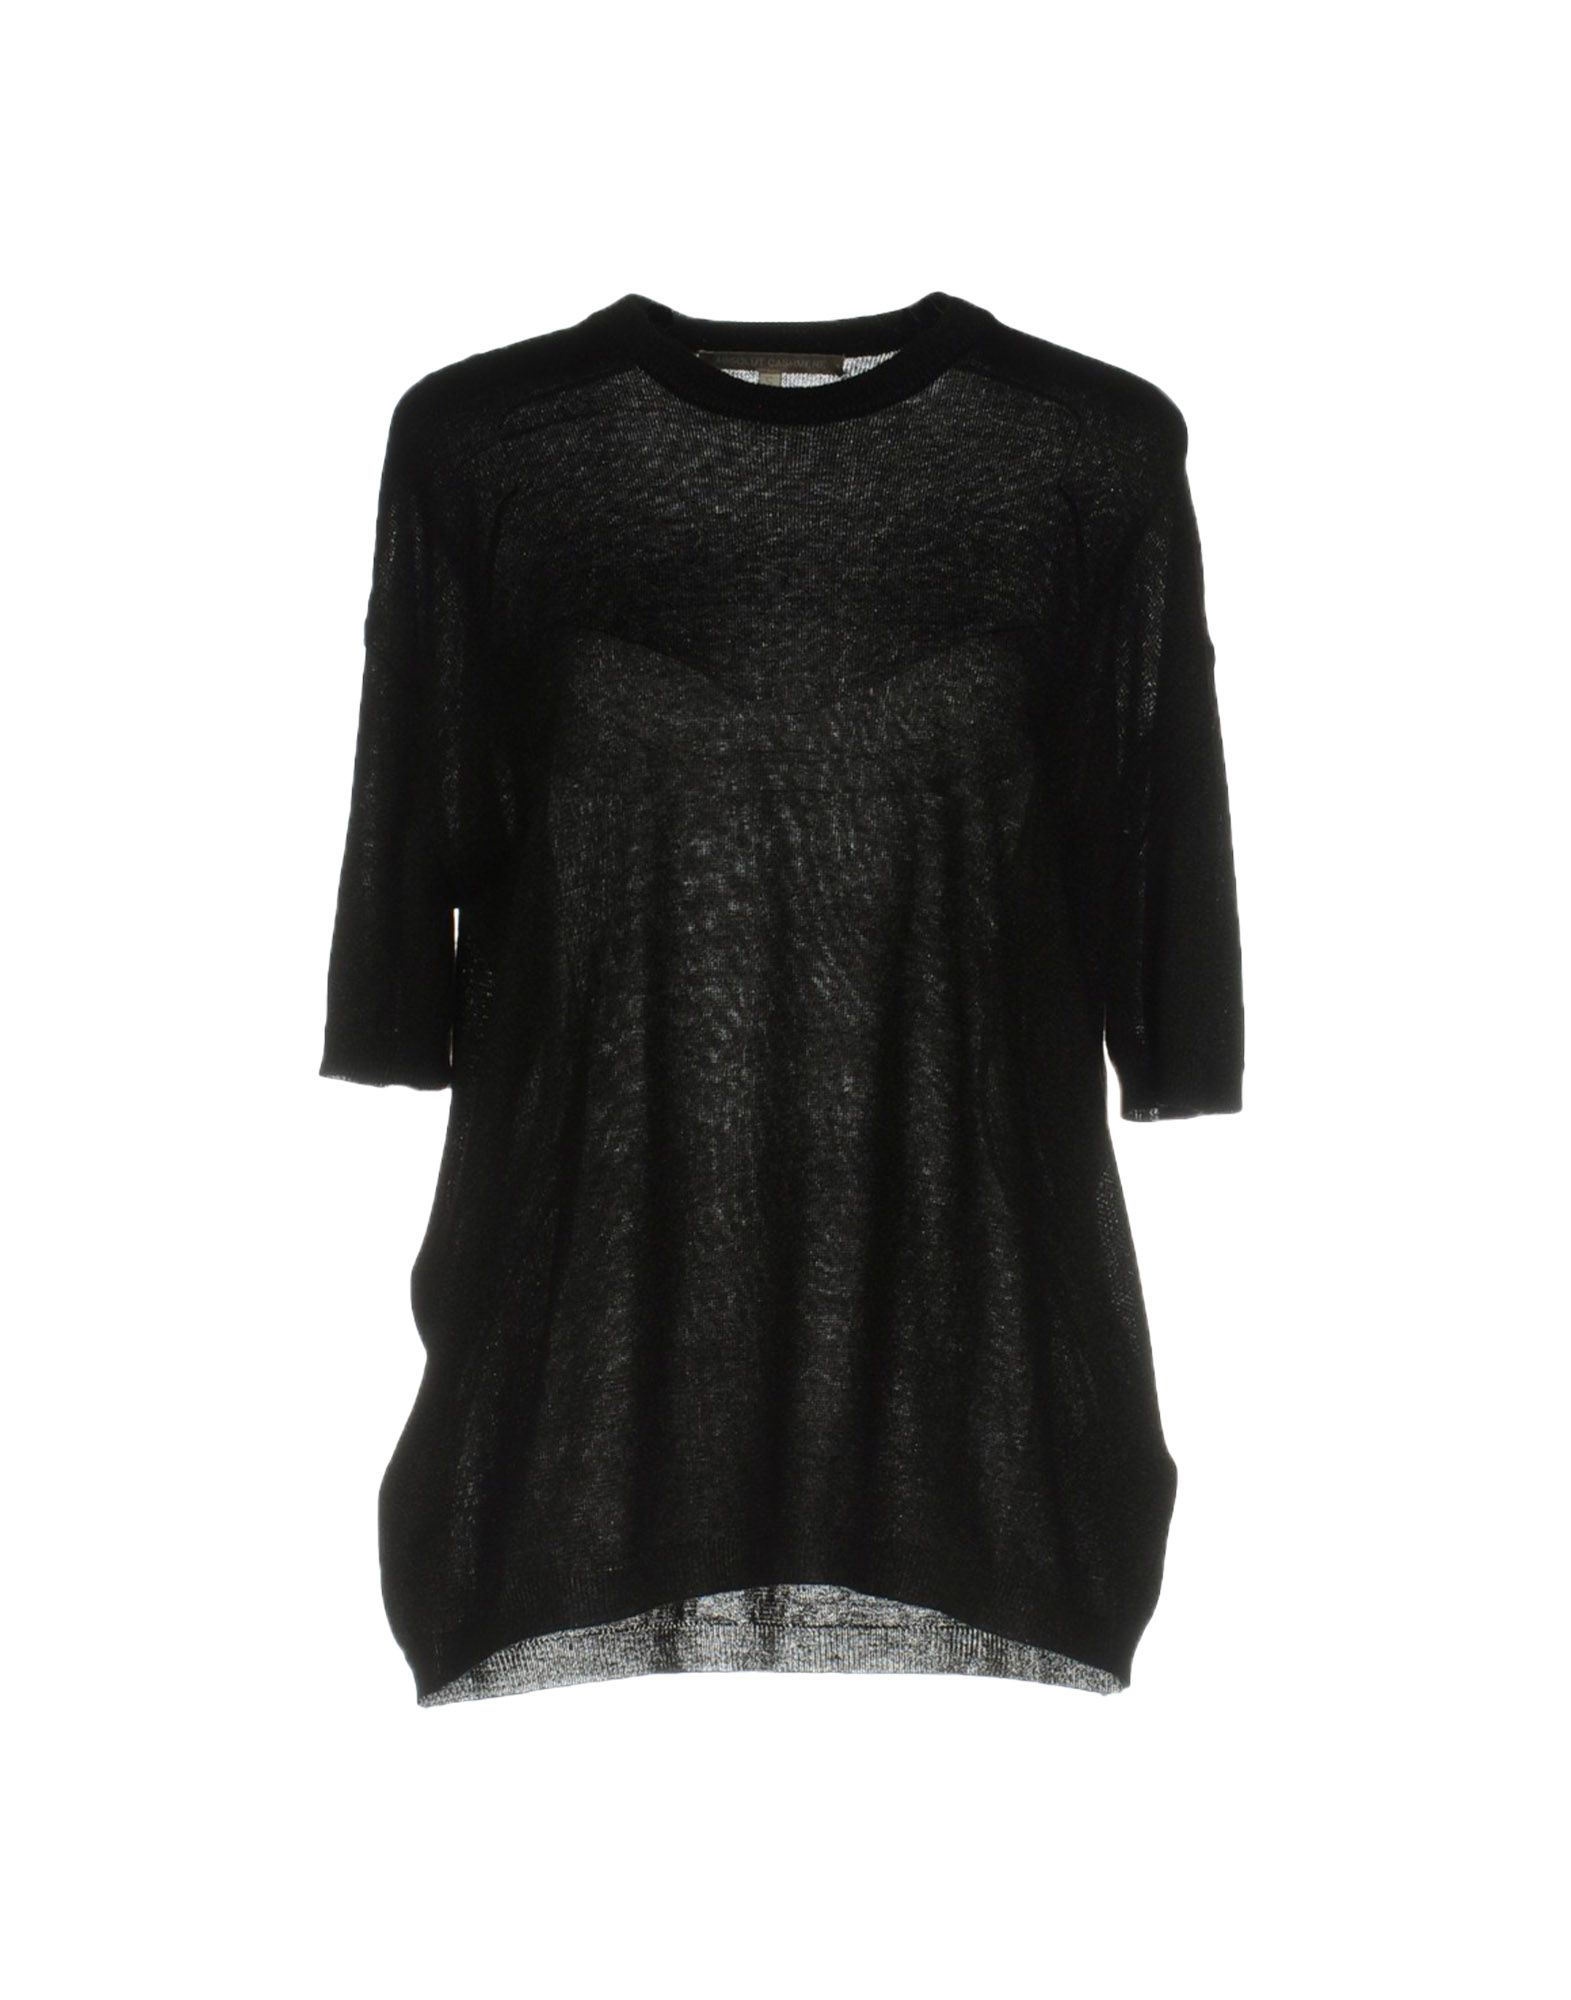 ABSOLUT CASHMERE Свитер autumn cashmere свитер